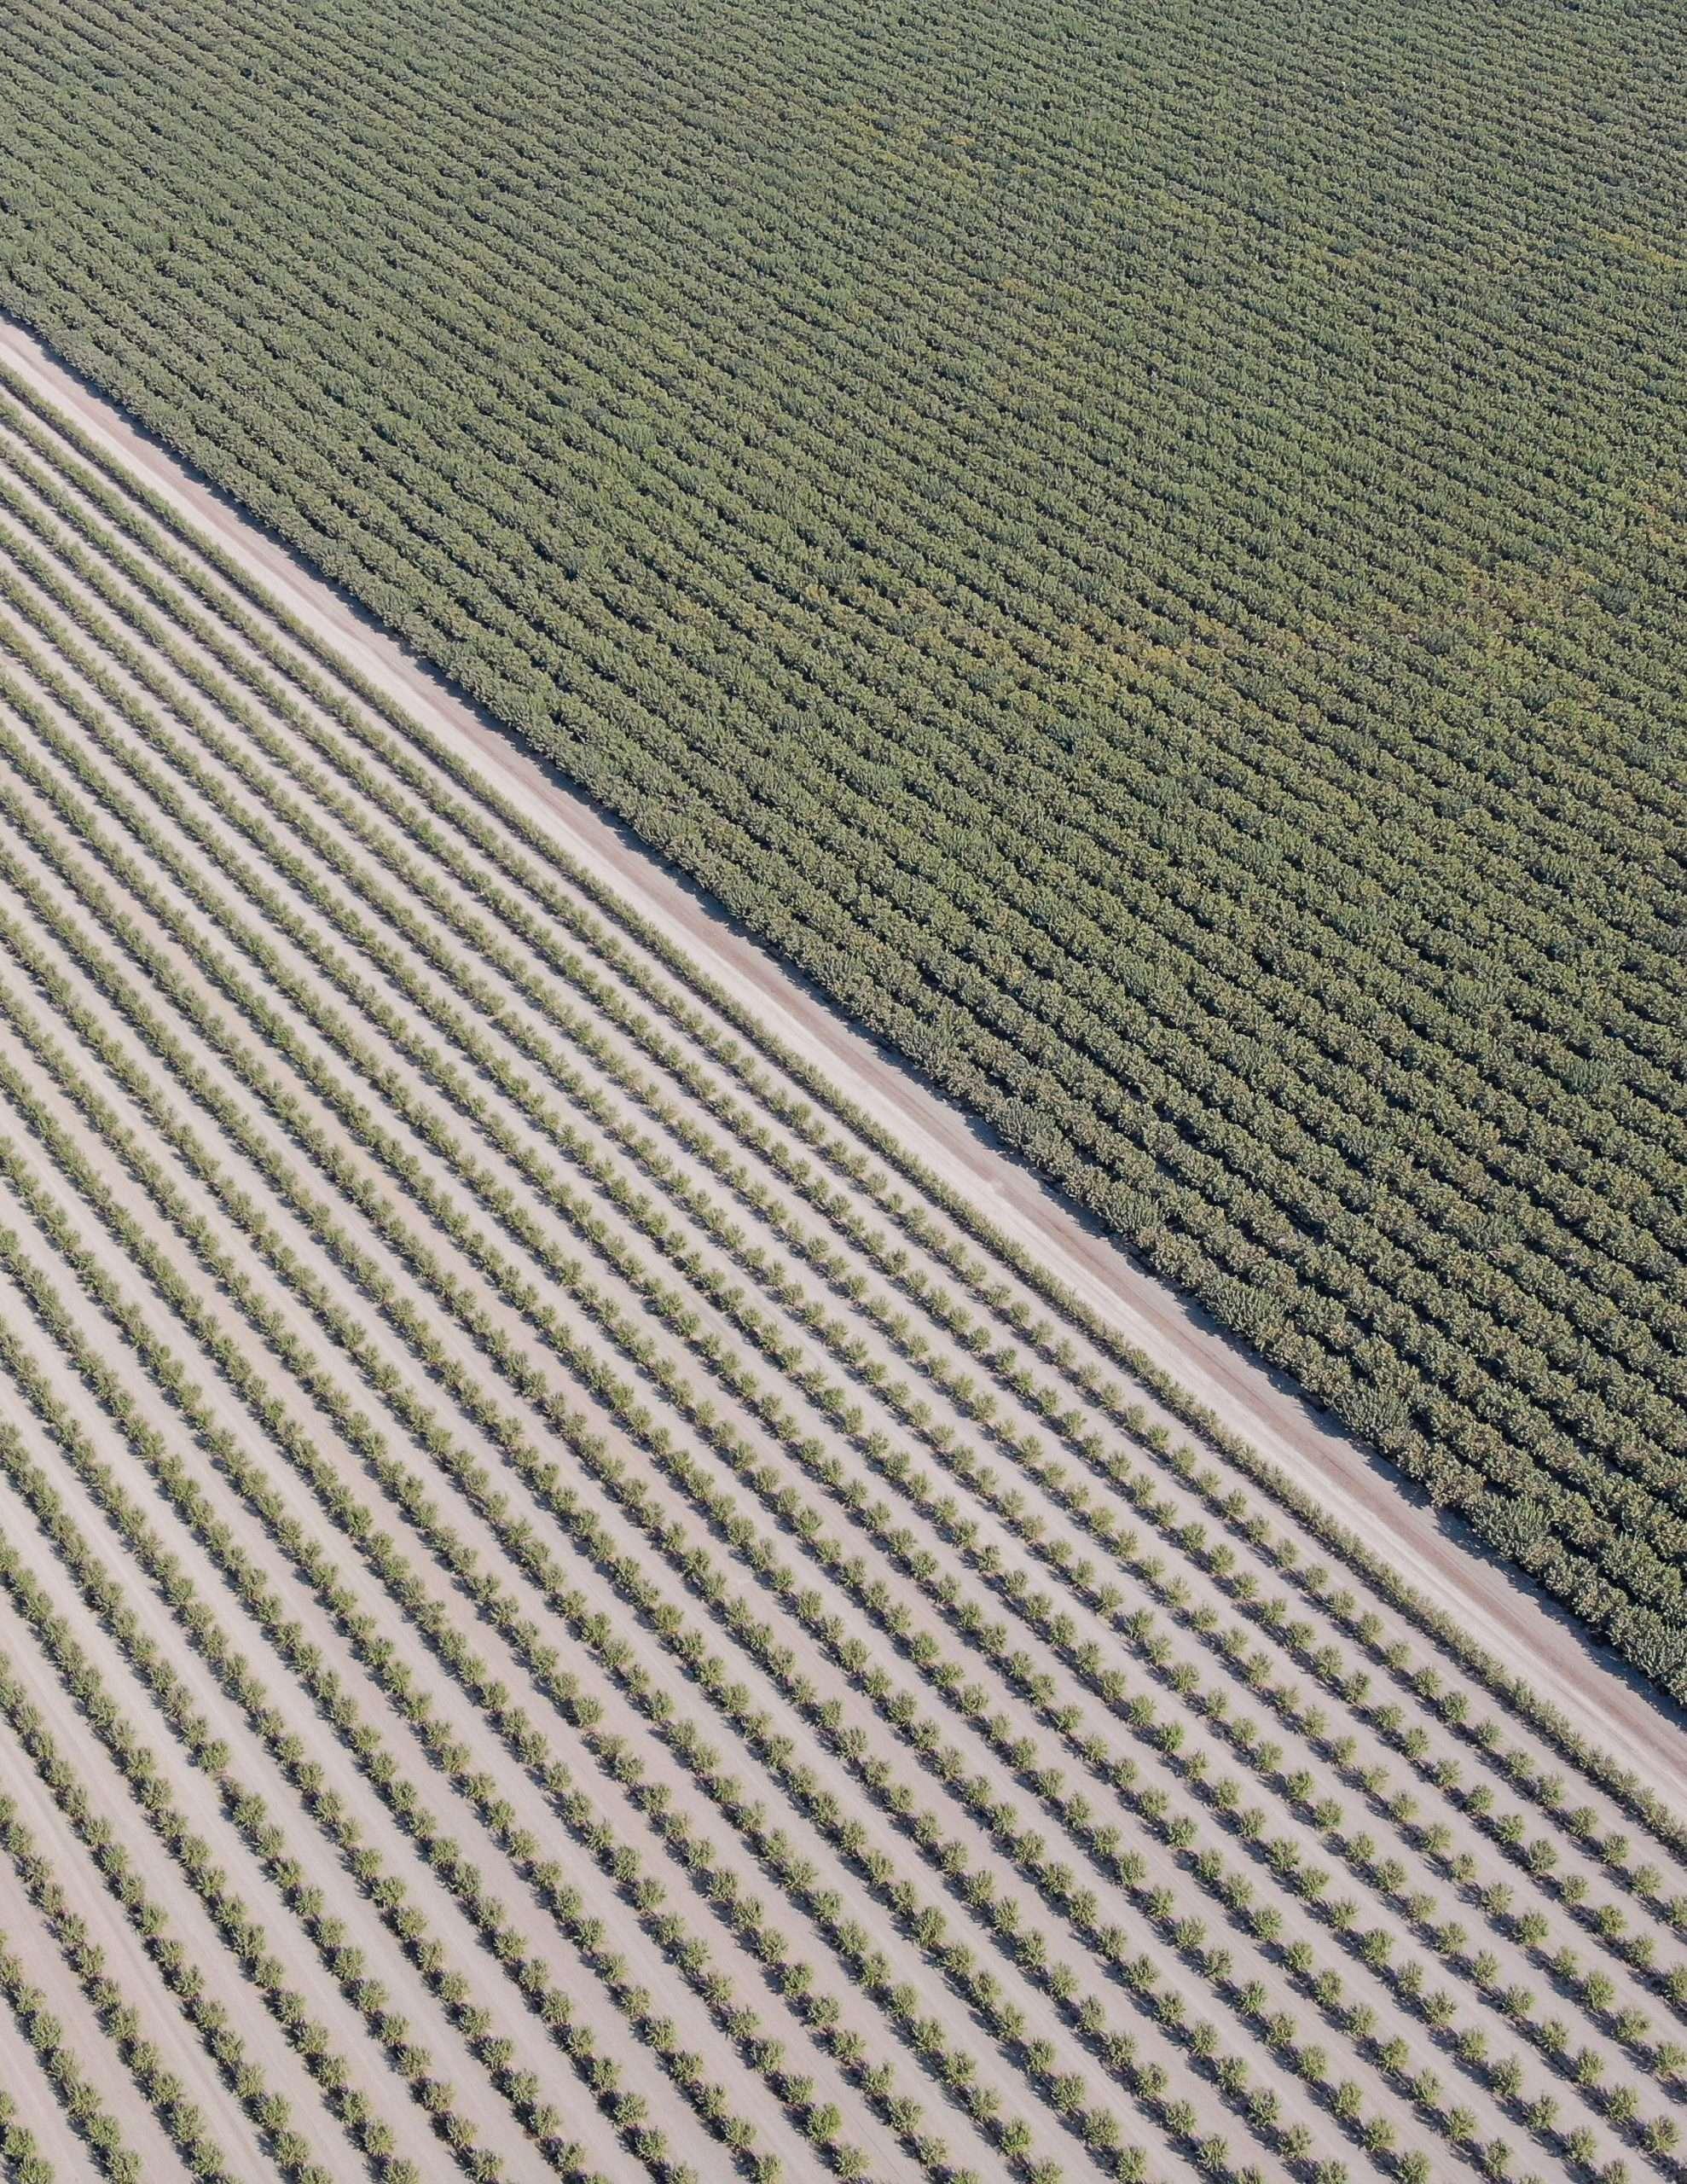 +/-852.15 Acres – Almonds, Pistachios, Alfalfa, and Open Land – Corcoran